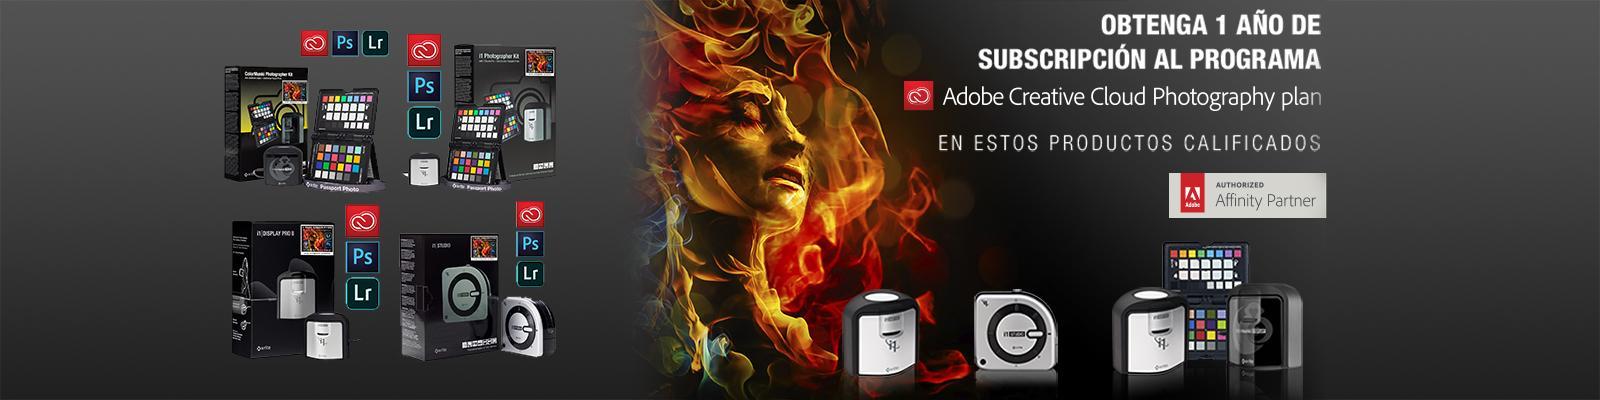 Oferta X-Rite + Adobe